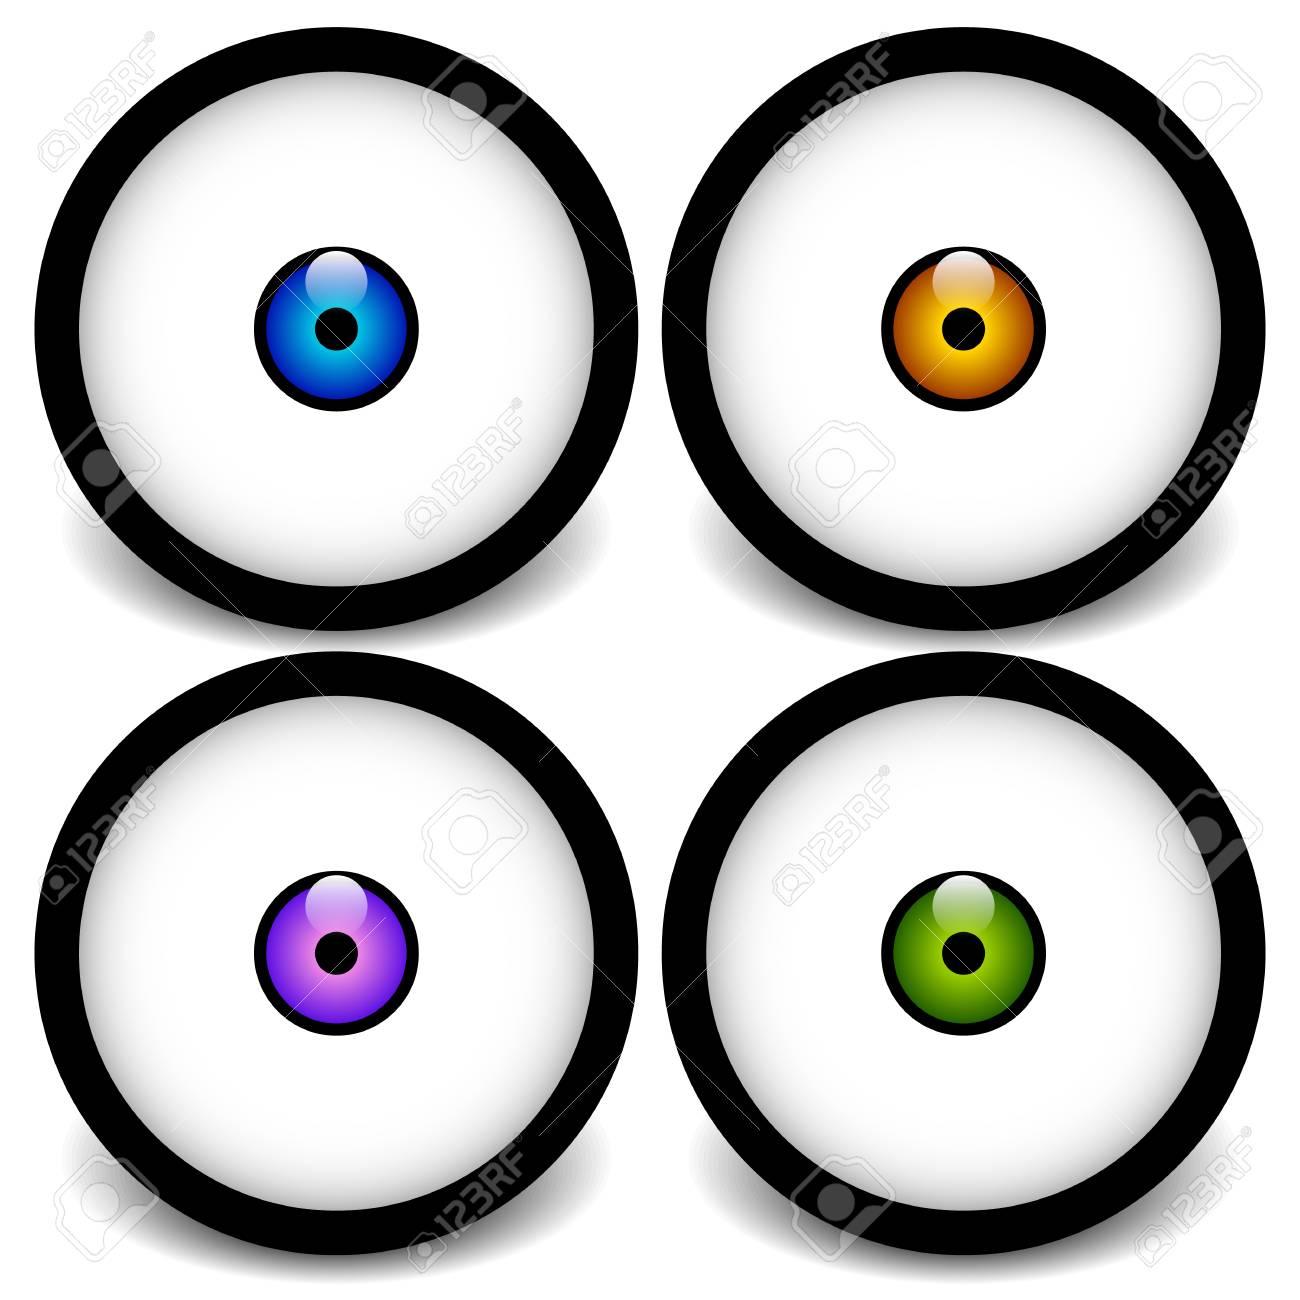 stylized eyeball icons graphics royalty free cliparts vectors and rh 123rf com free vector eyeball eyeball vector png